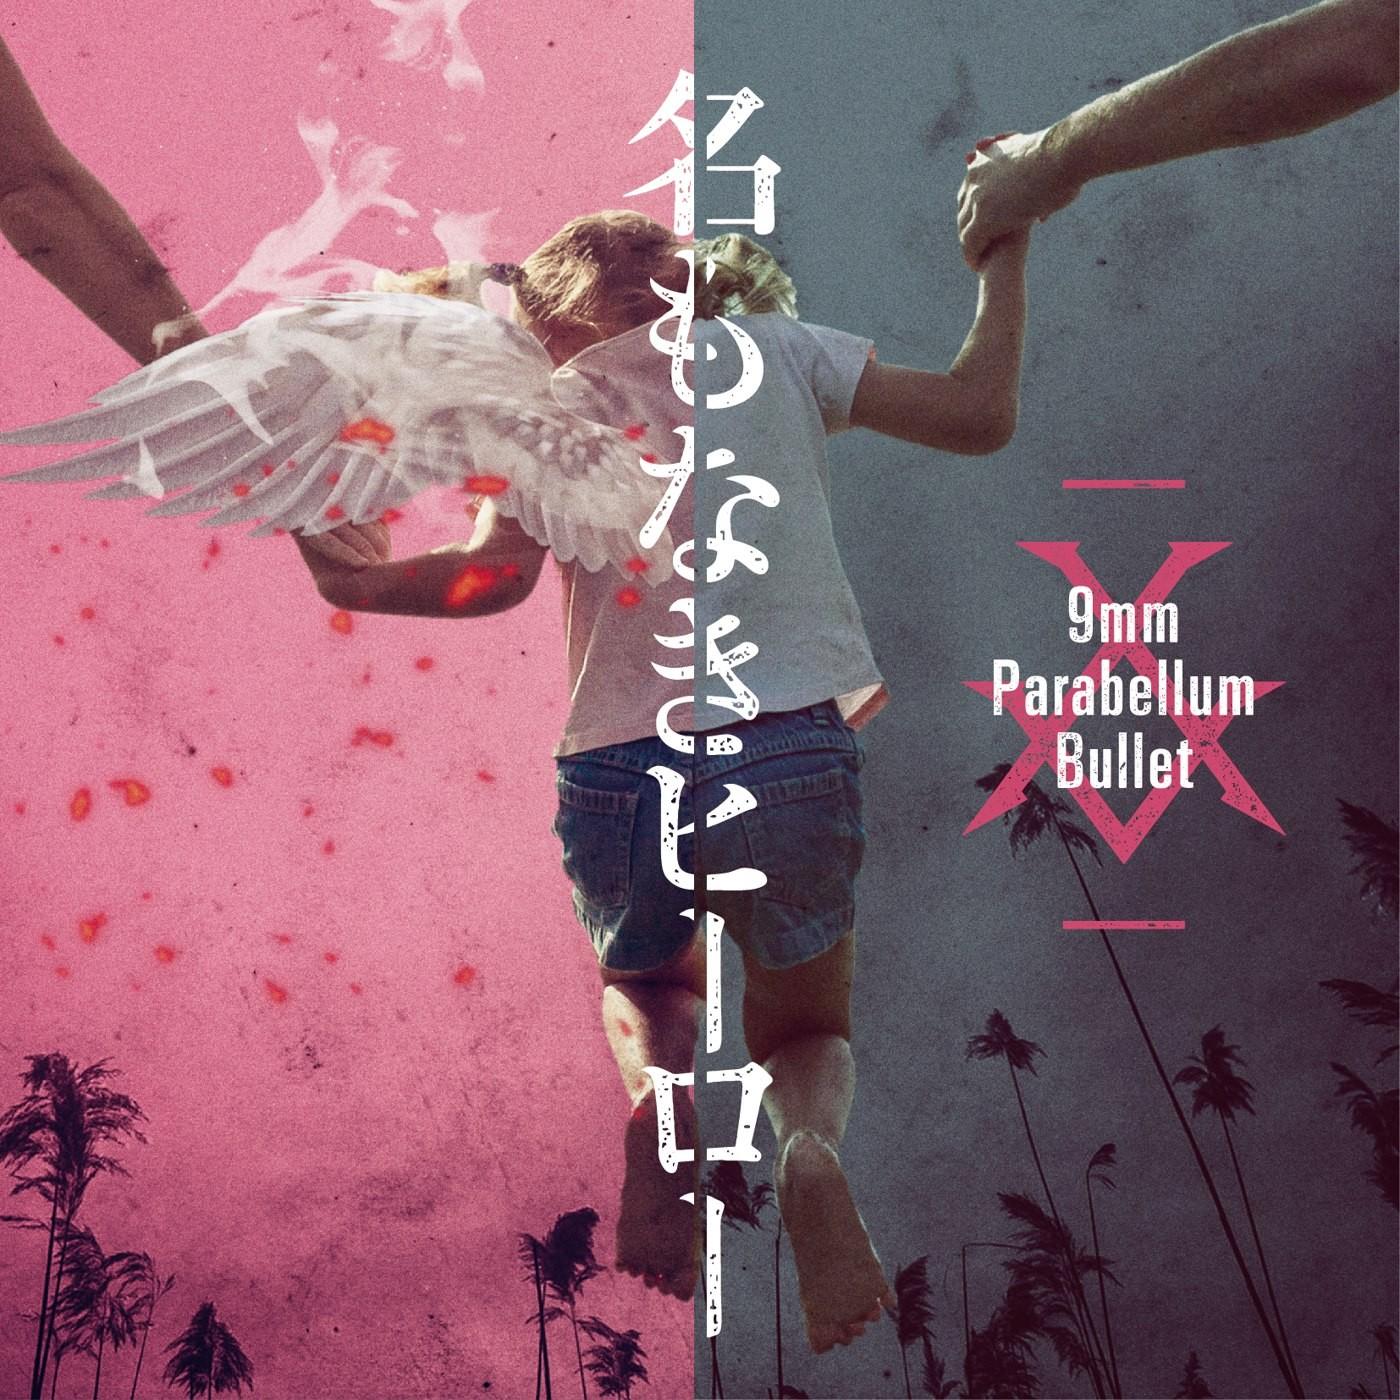 9mm Parabellum Bullet – 名もなきヒーロー [FLAC + MP3 VBR / CD] [2019.04.10]